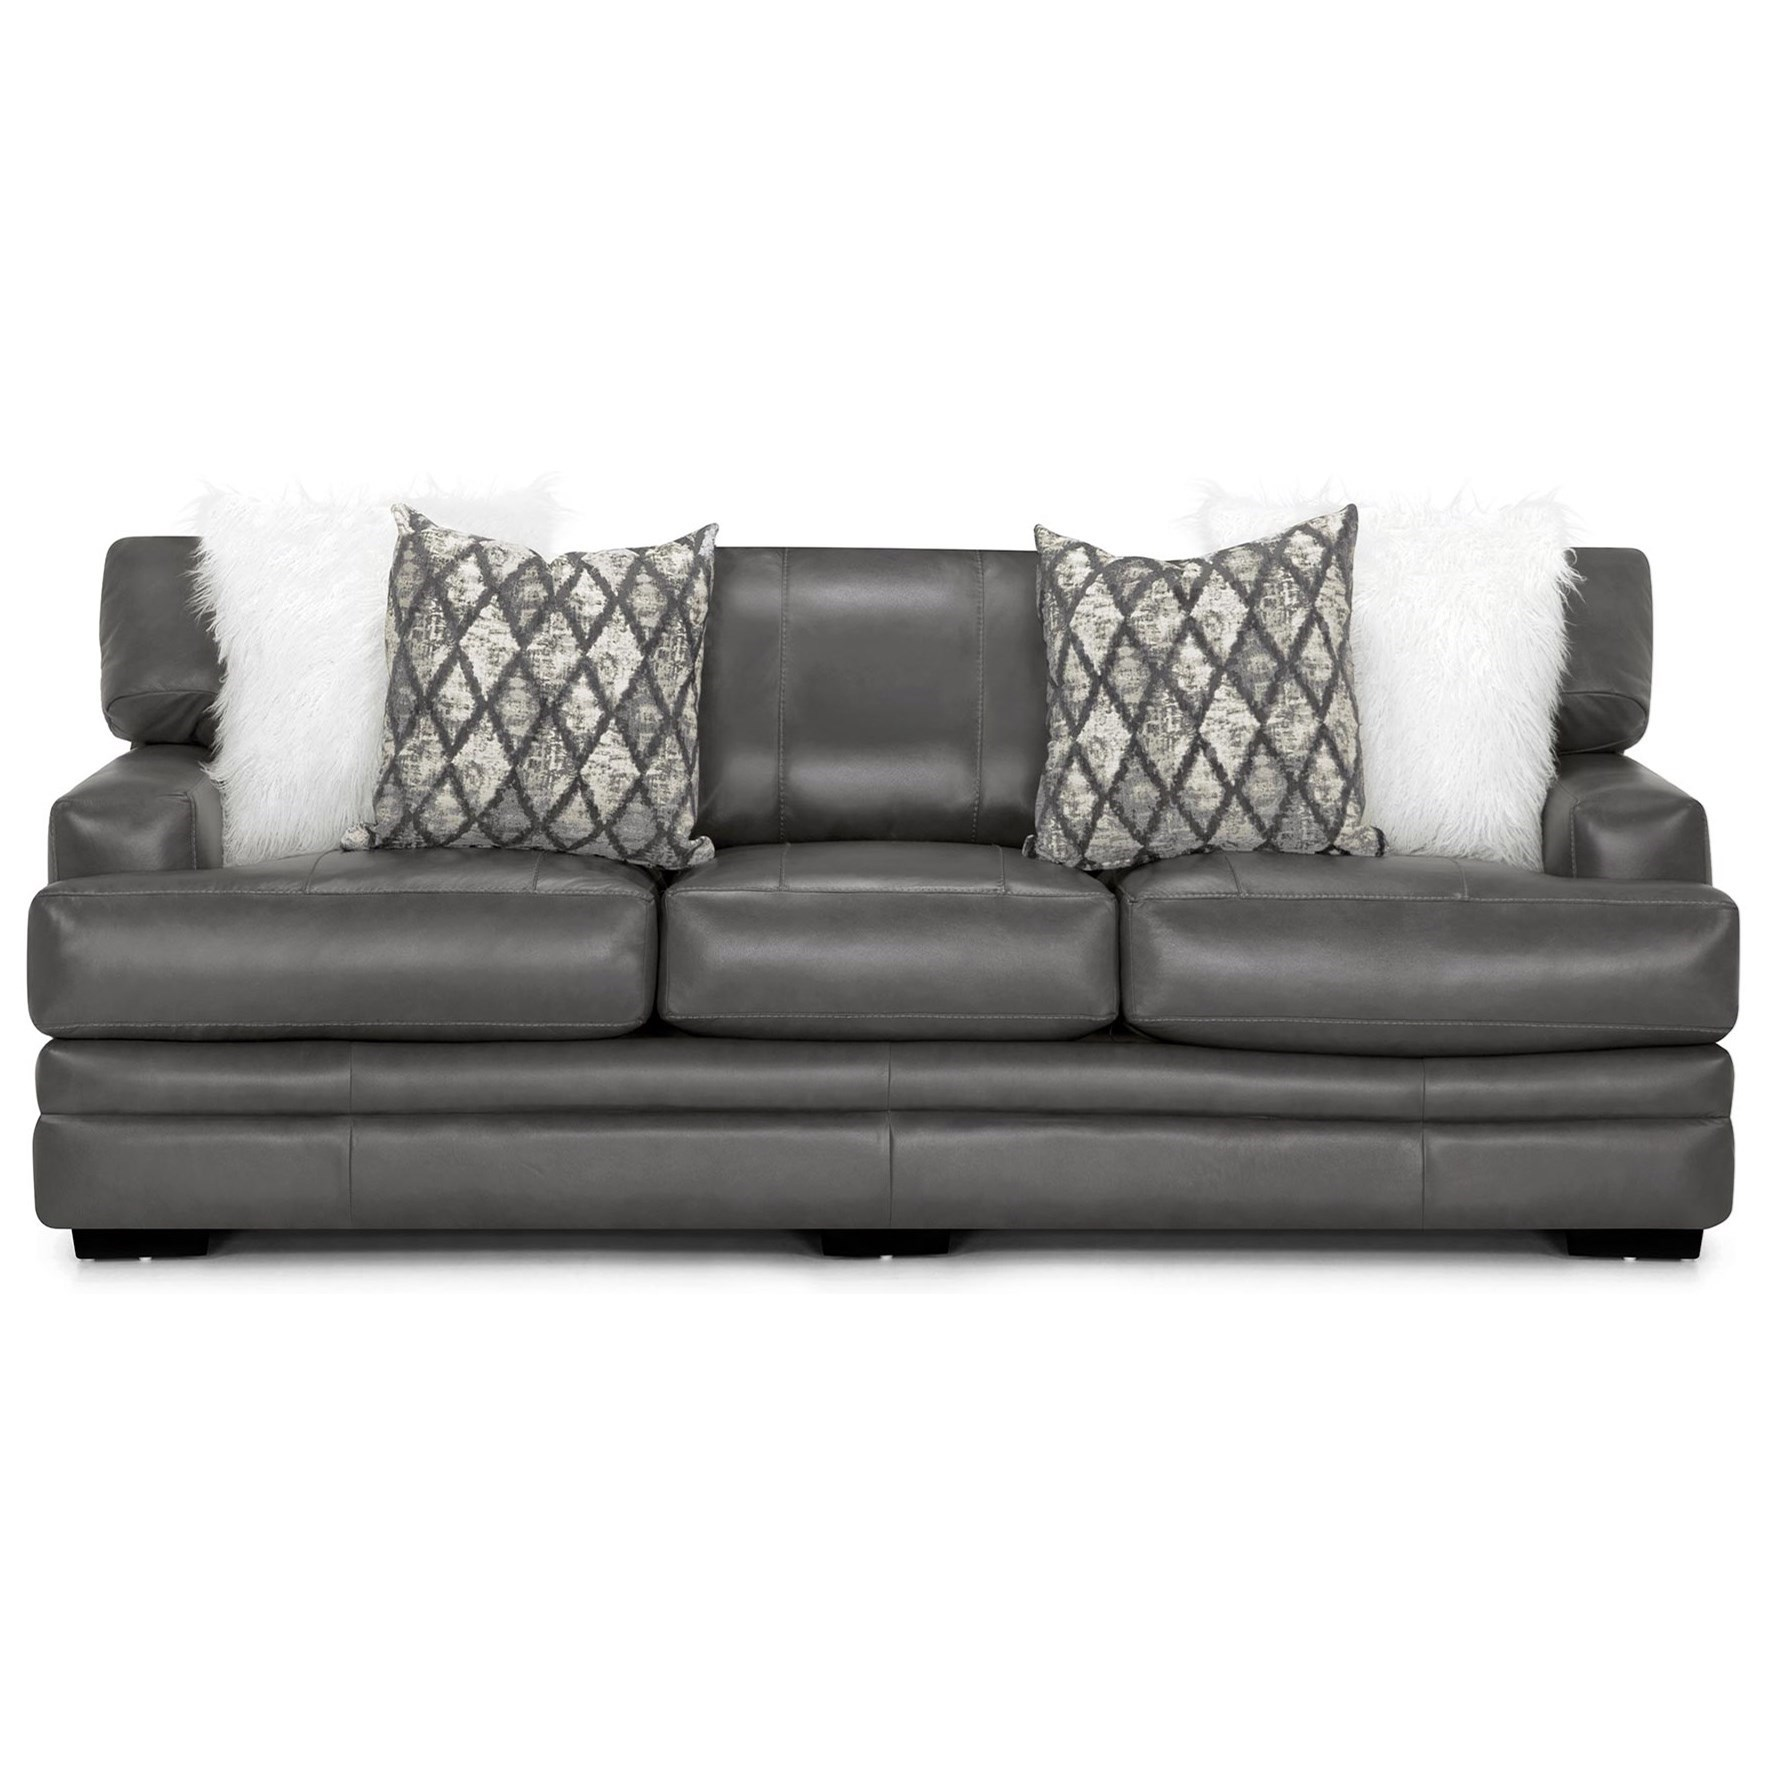 973 Sofa by Franklin at Virginia Furniture Market